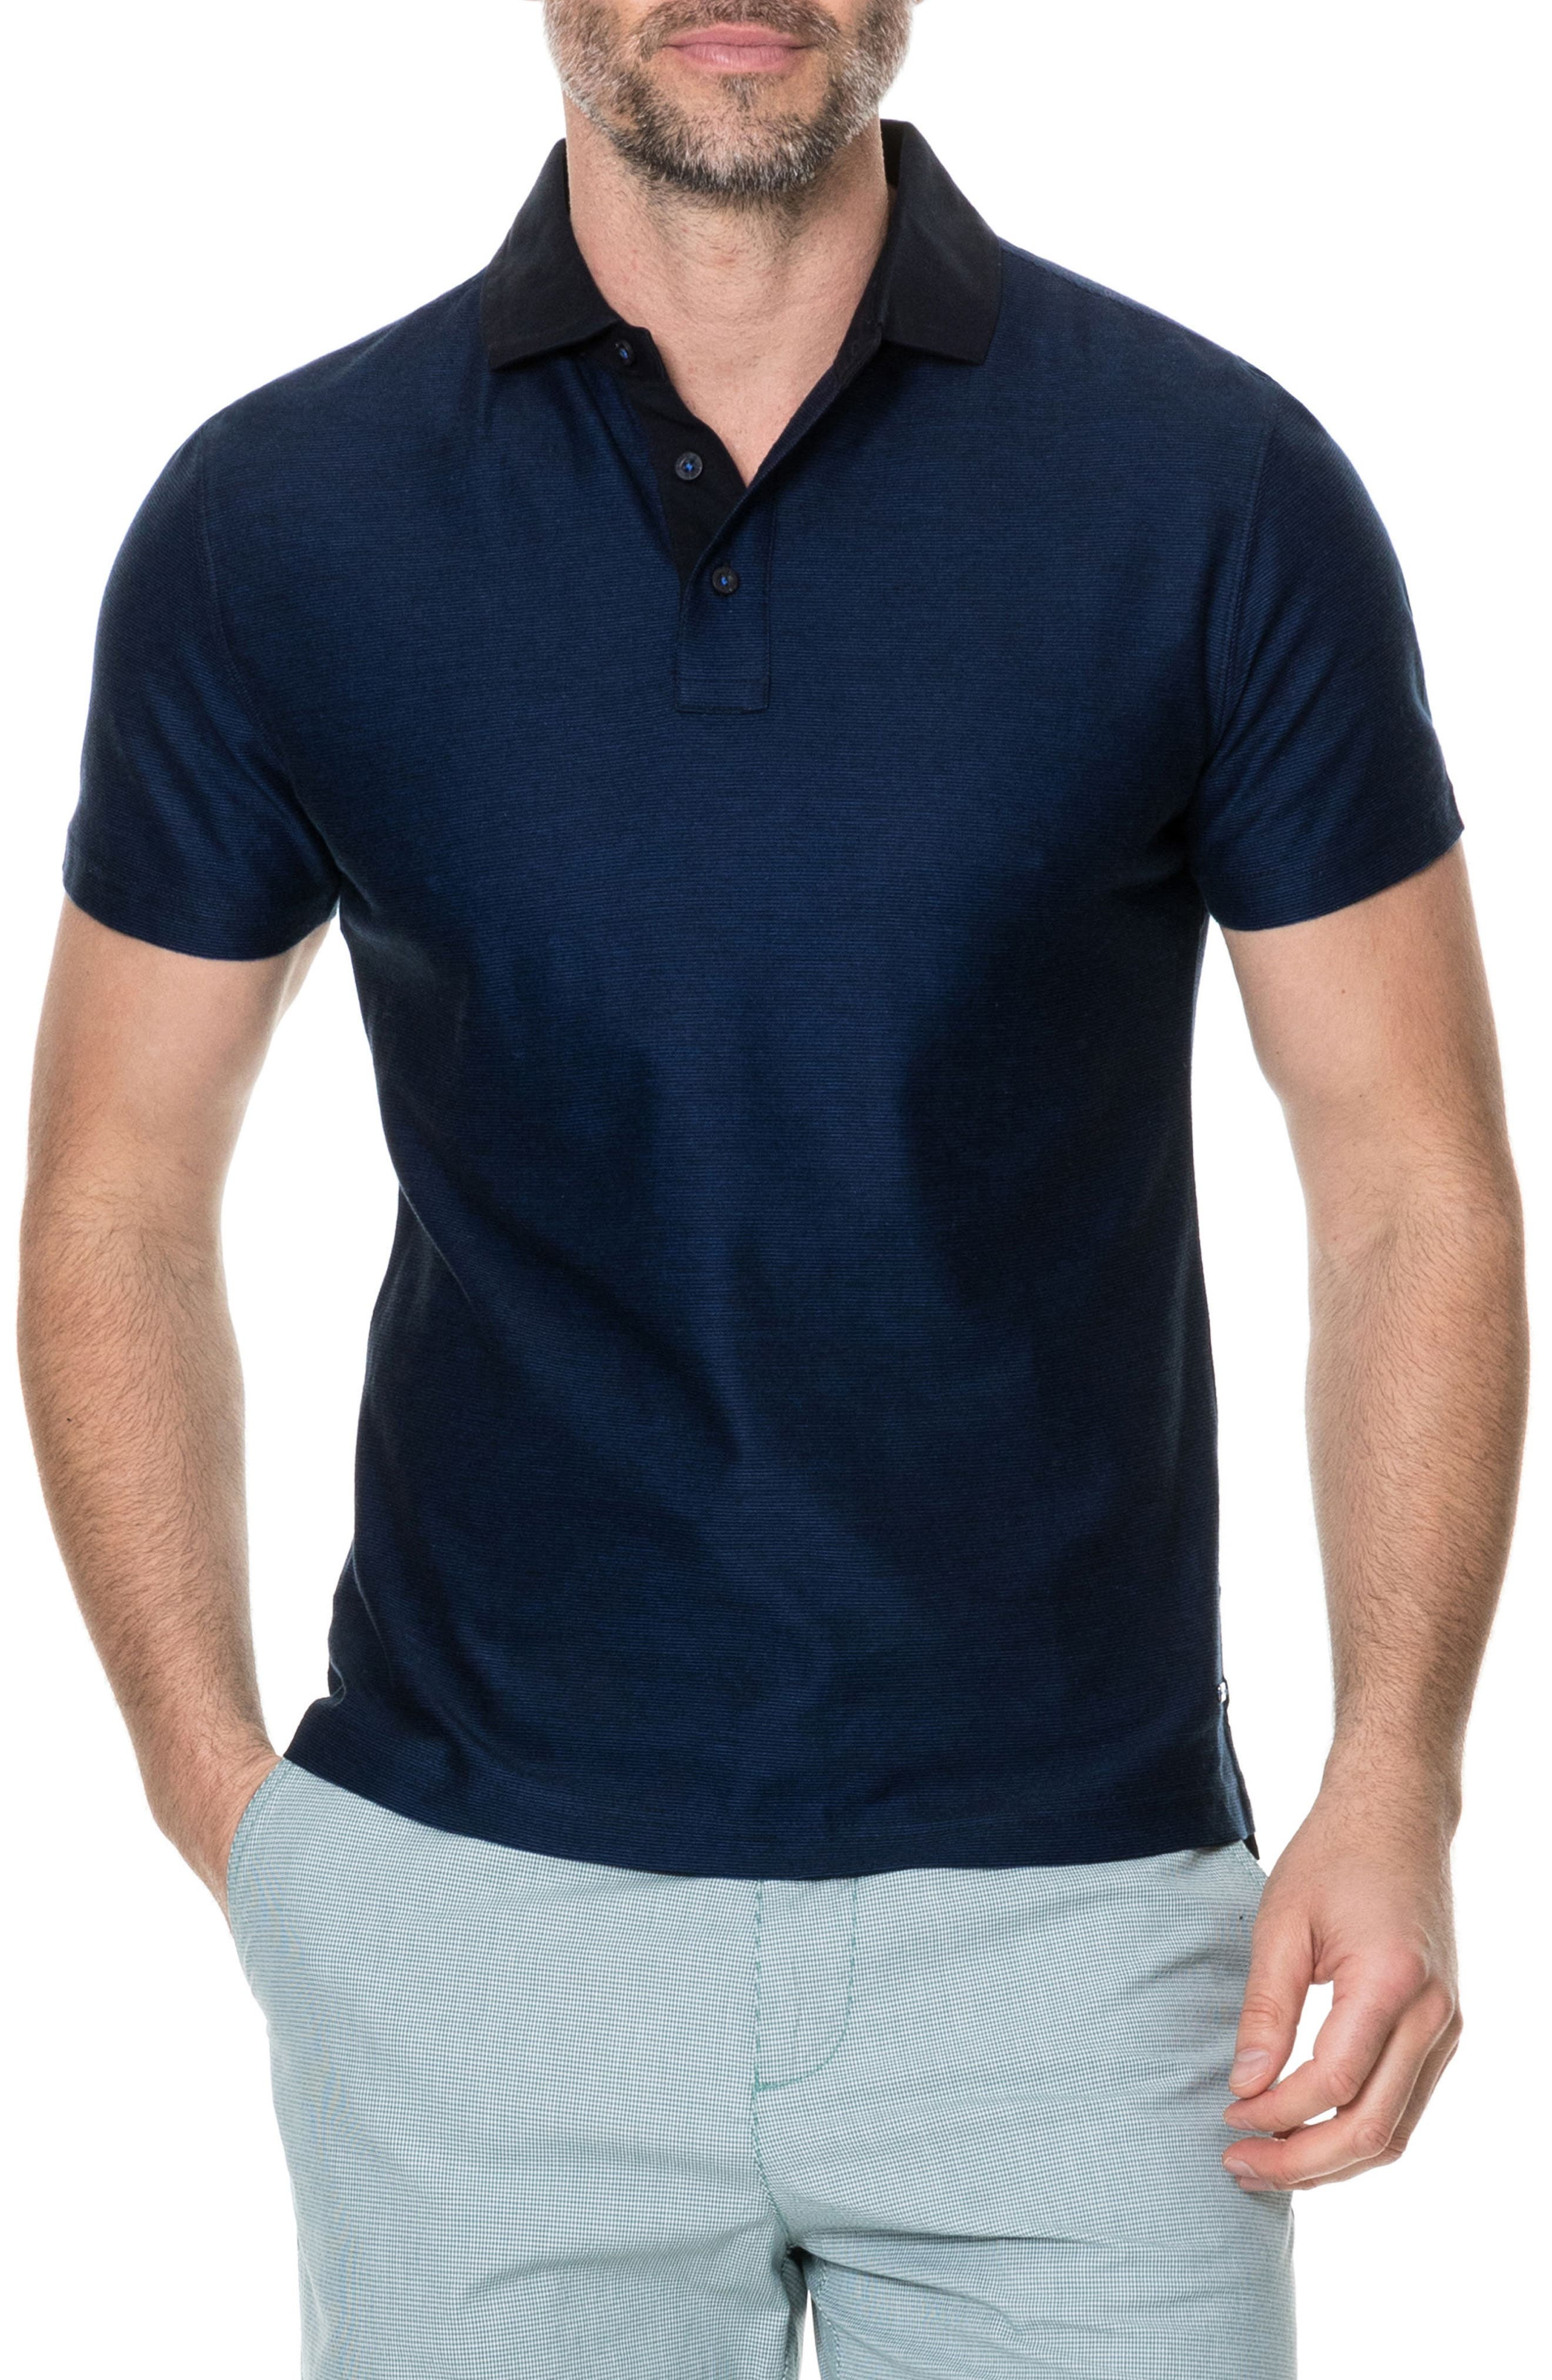 Caplestone Regular Fit Polo,                         Main,                         color, Ink